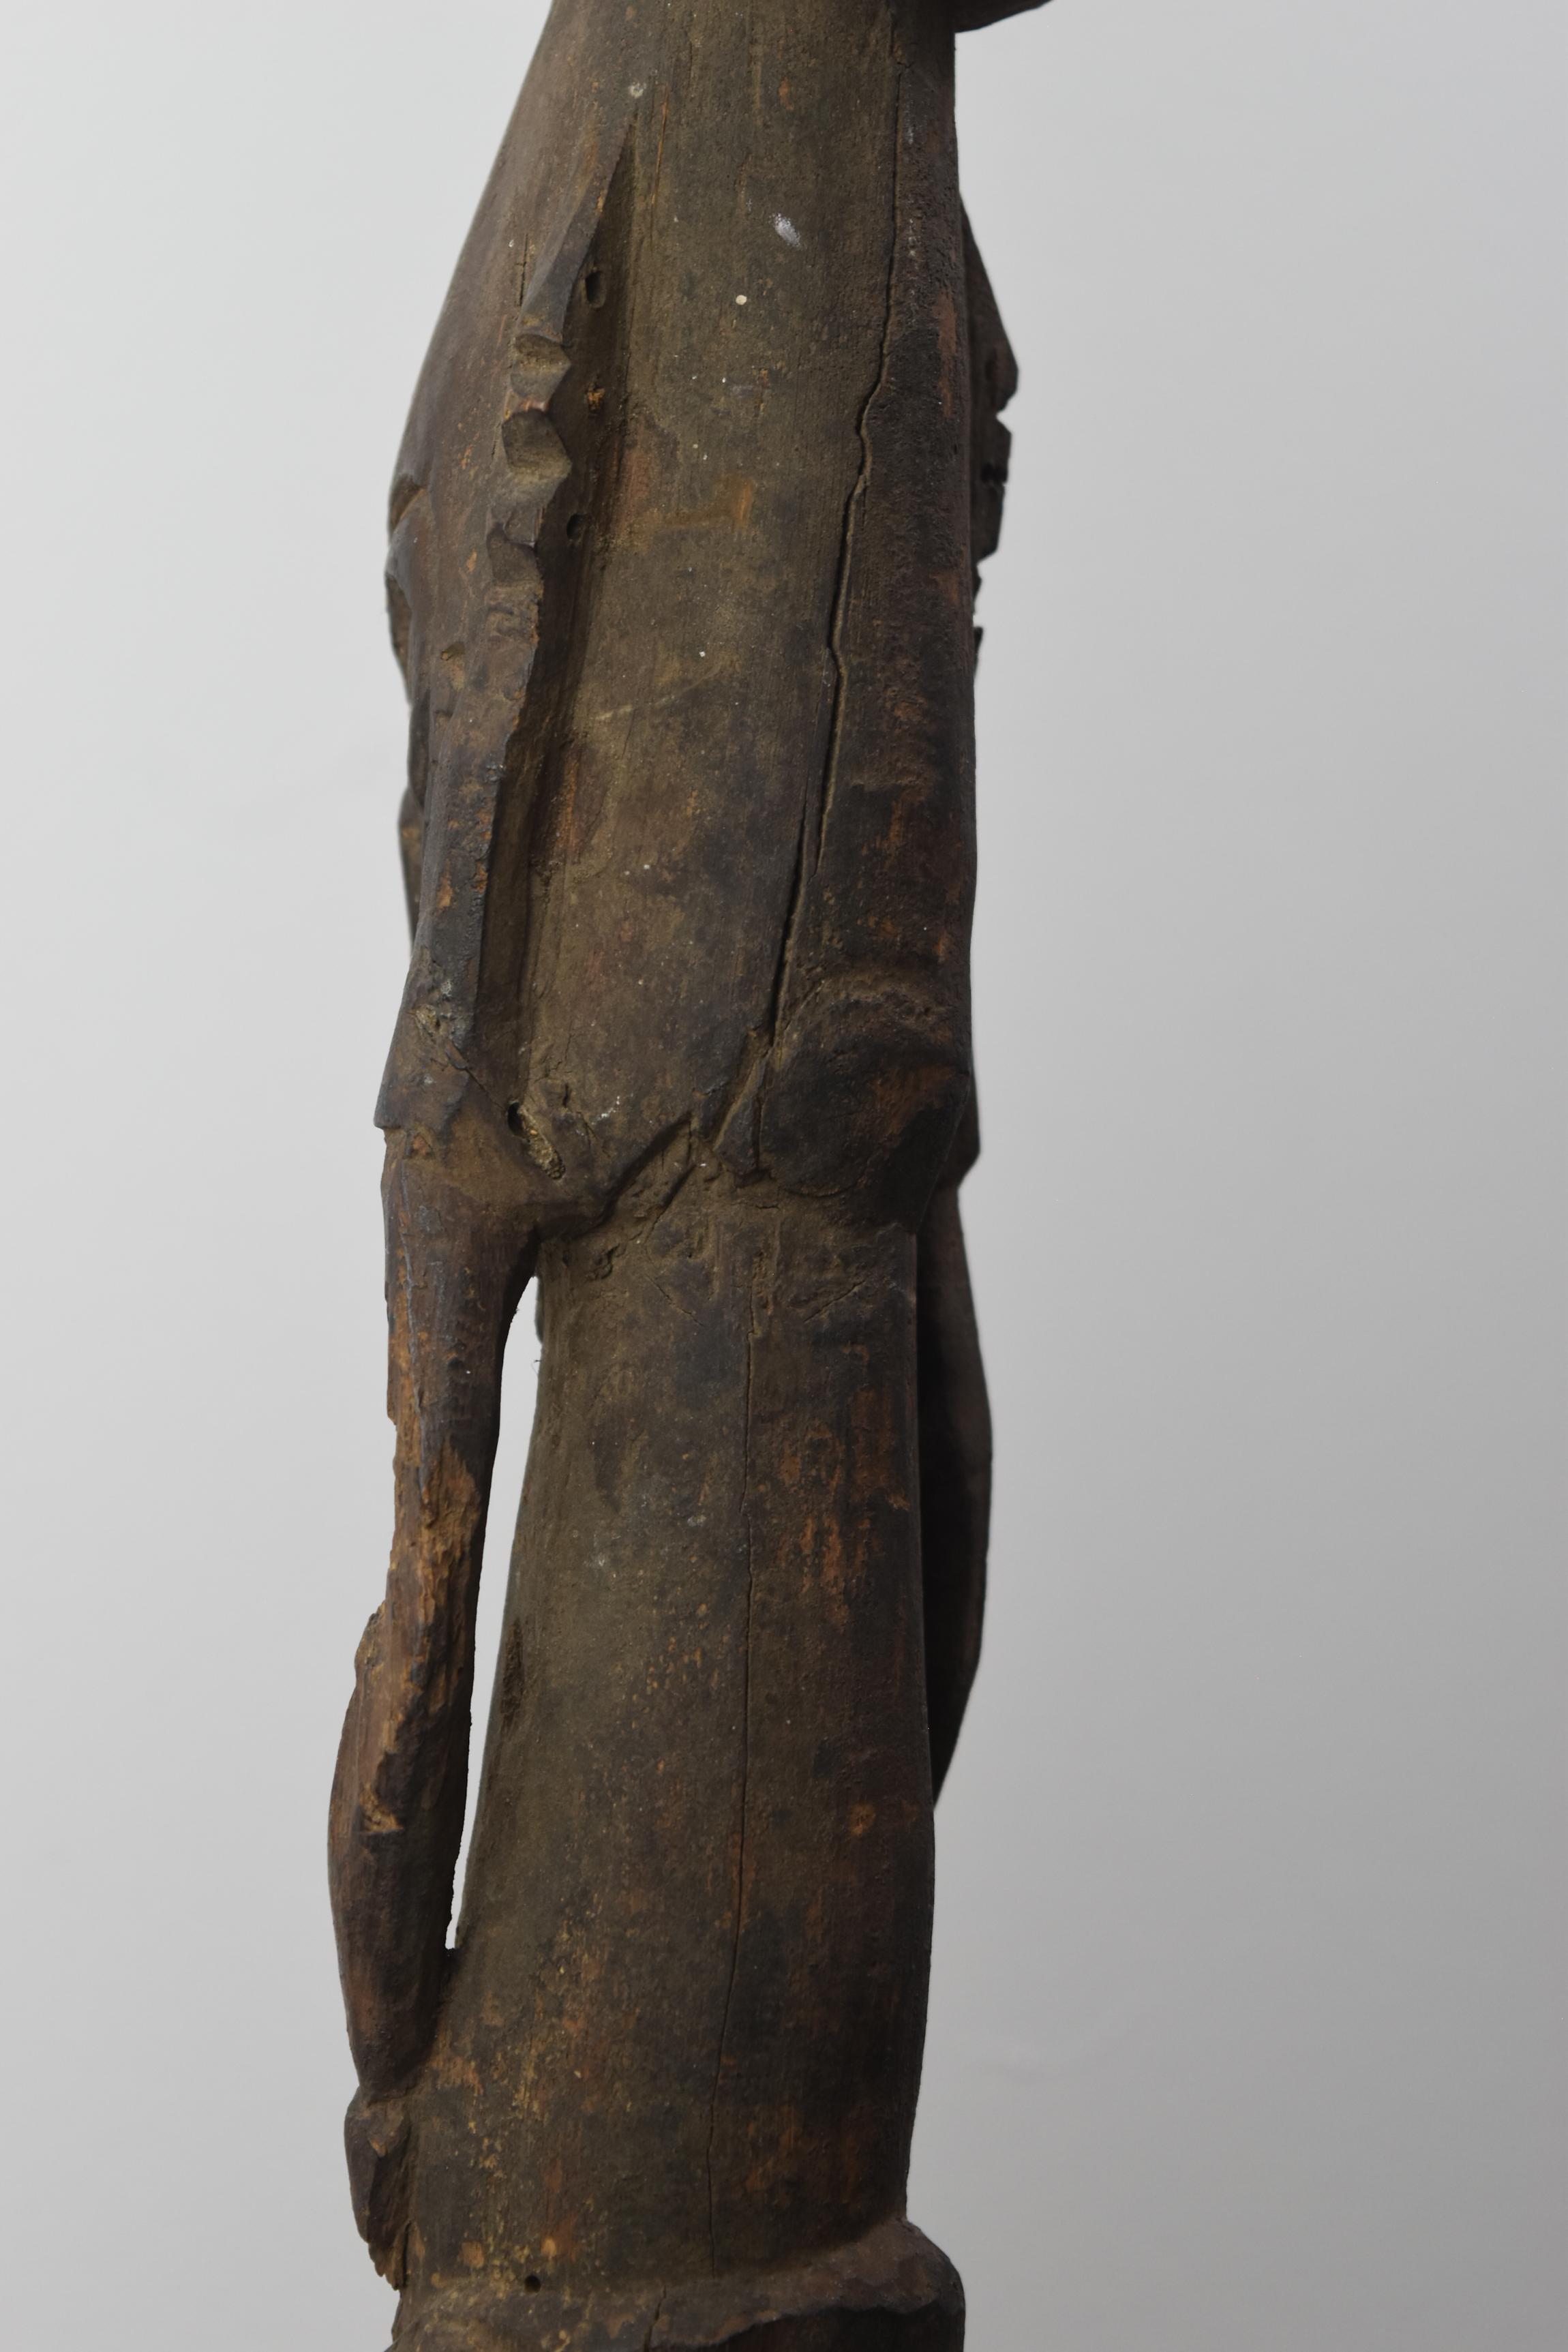 Sepik-Ramu Estuary Figure